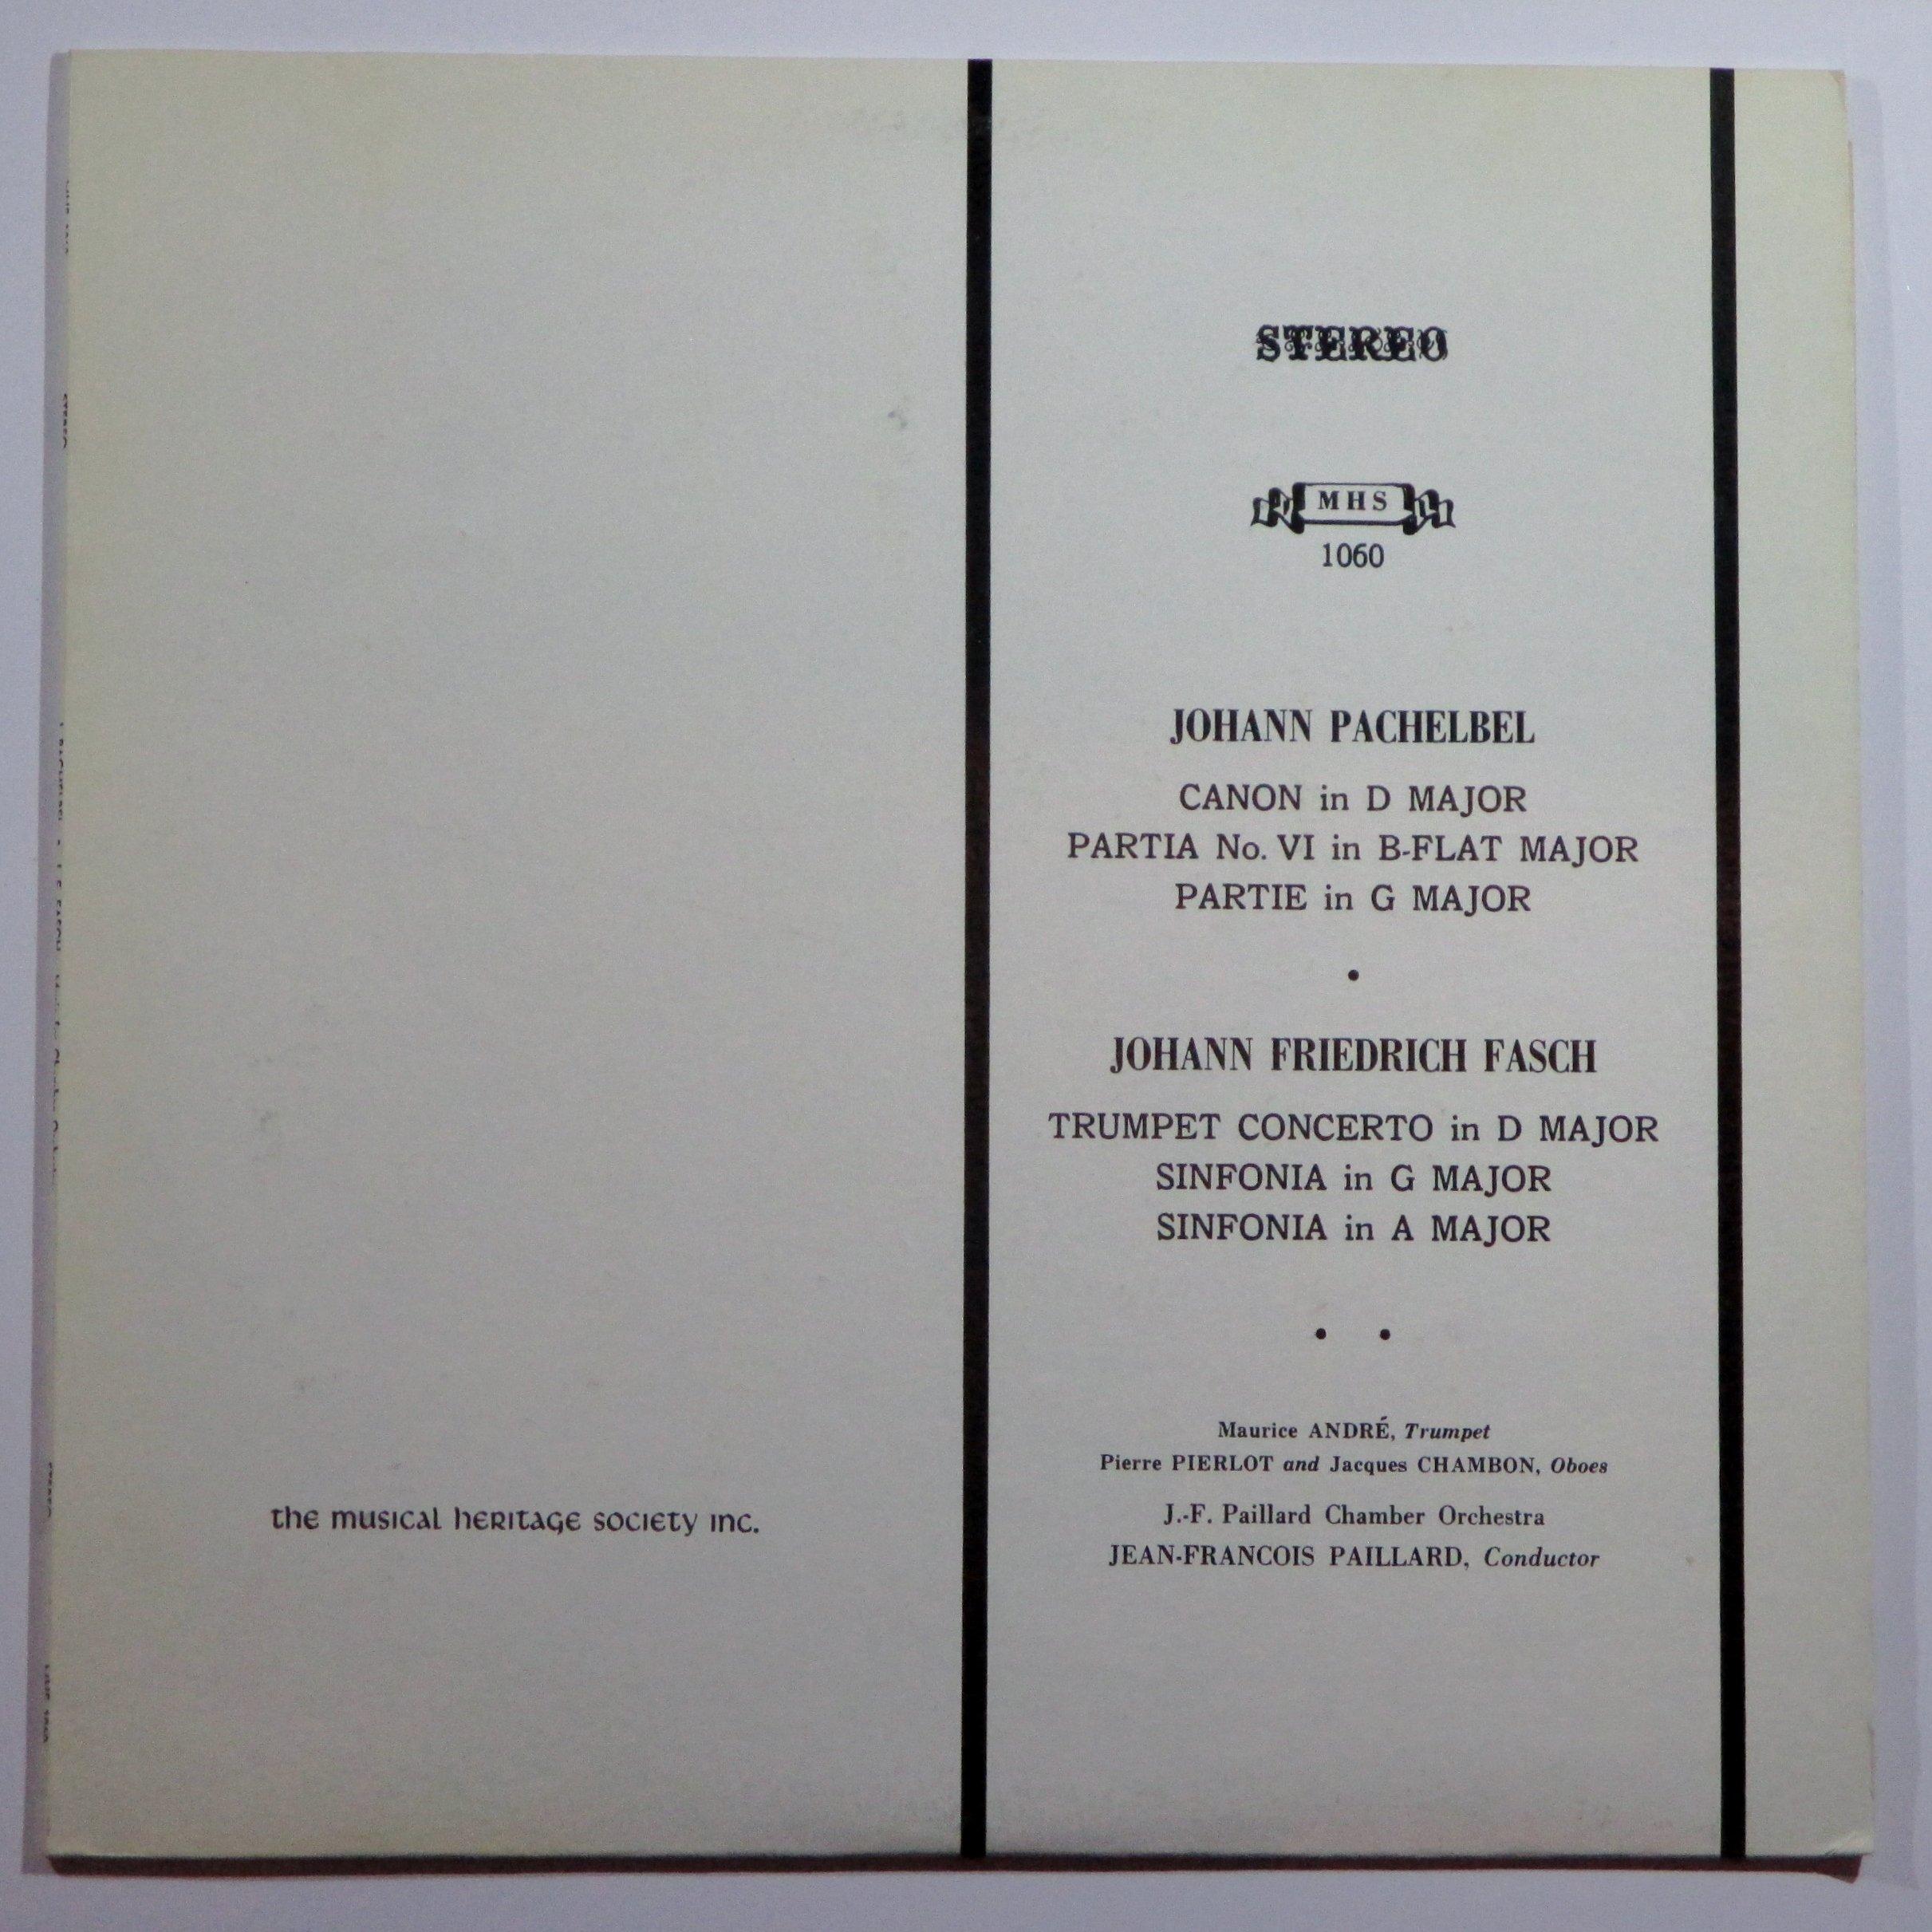 Pachelbel: Canon in D / Partita no VI / Partie in G / Fasch: Trumpet Concerto in D Major / Sinfonia in G / Sinfonia in A